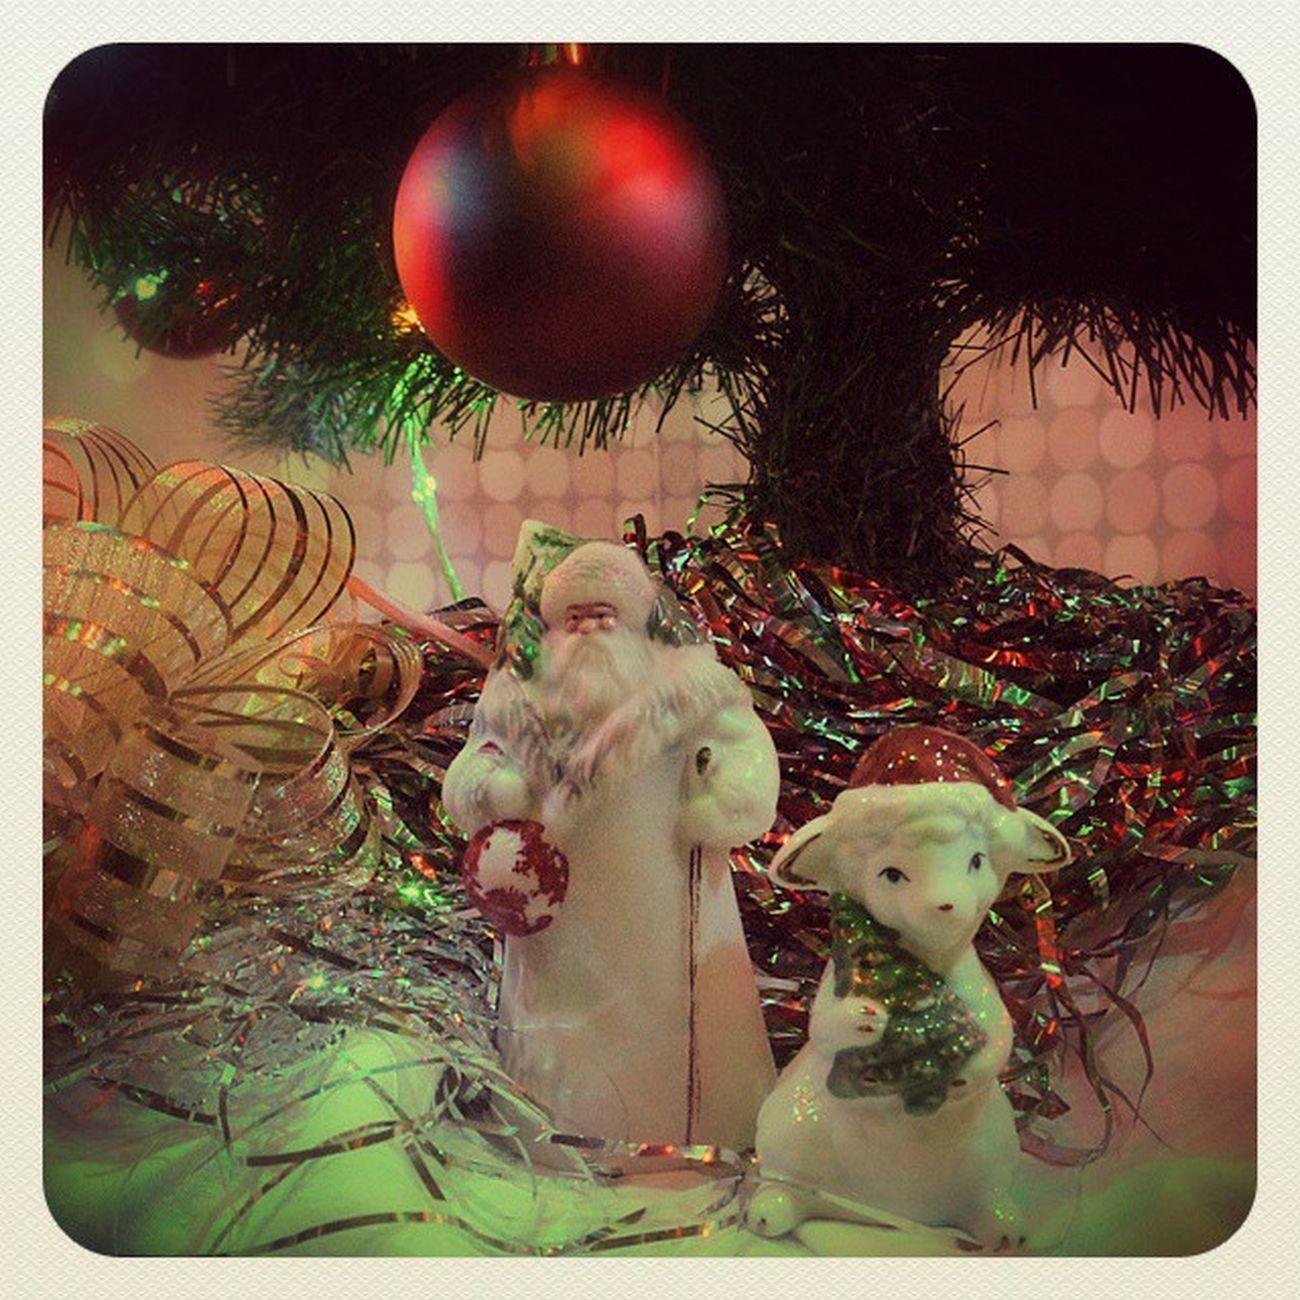 NewYear Newyearday Christmas Christmastree Ded_moroz Yearofsheep новыйгод рождество годовцы дедмороз